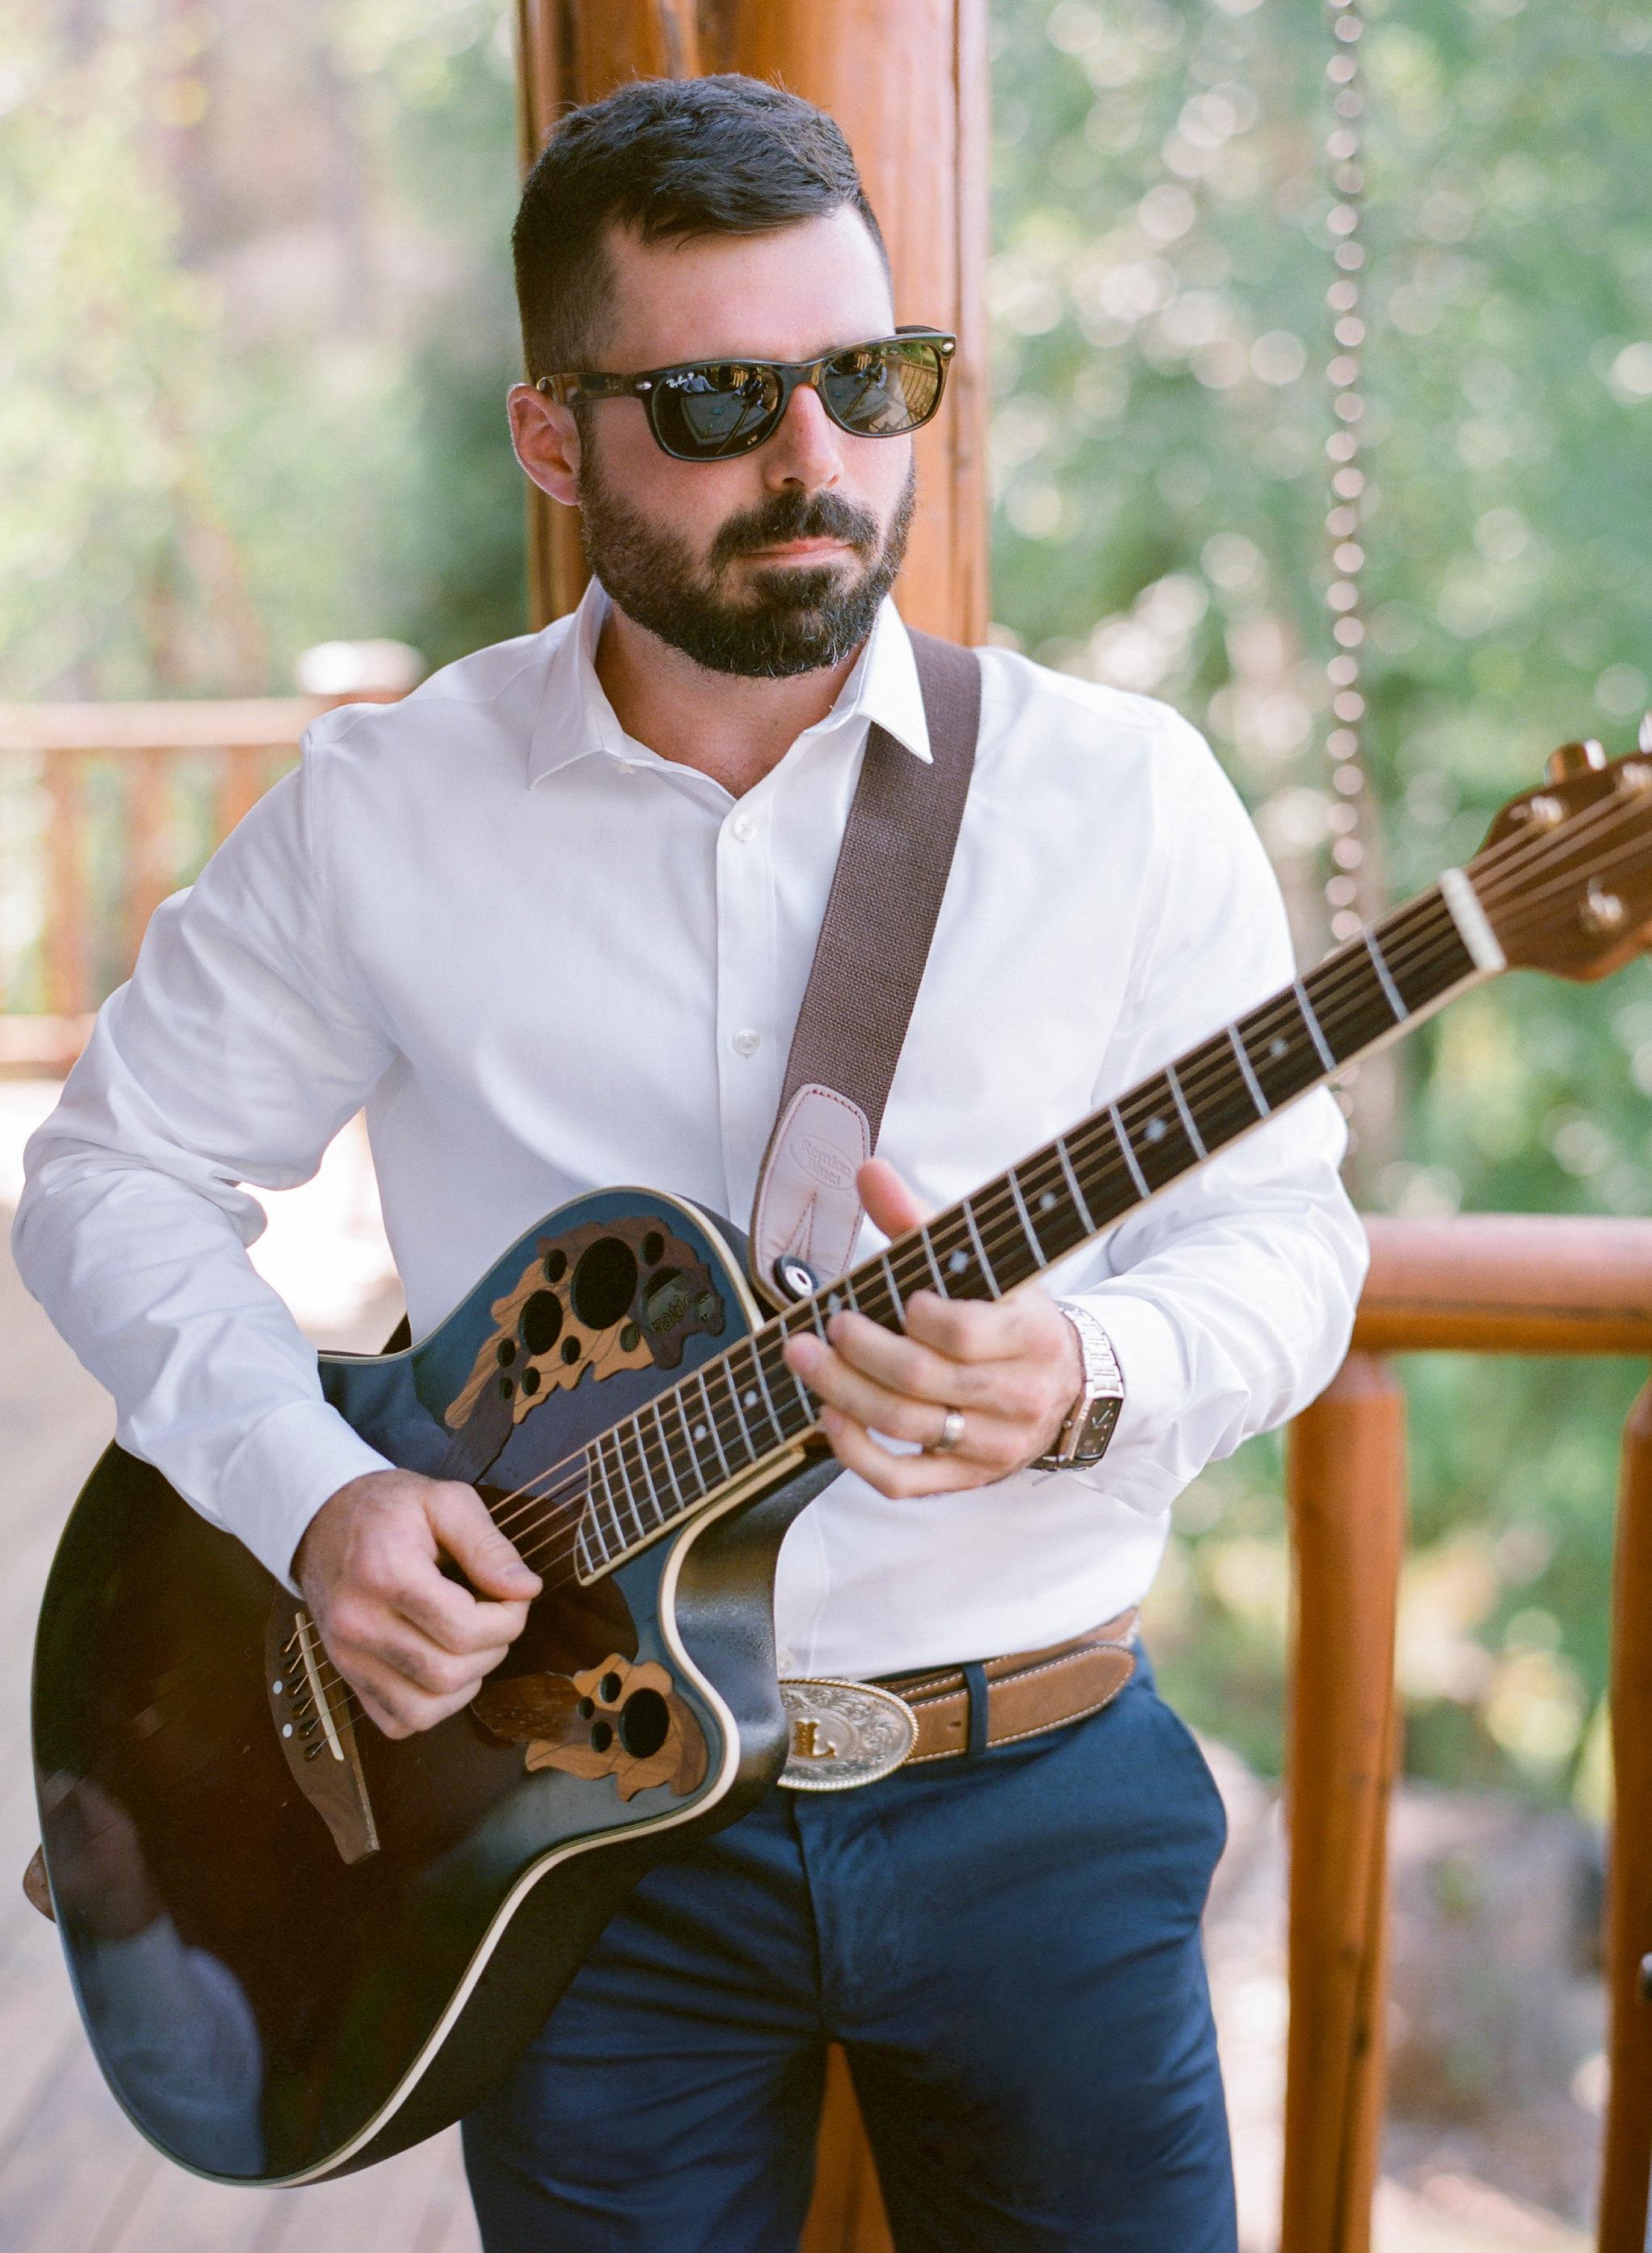 wedding guitar player sunglasses beard